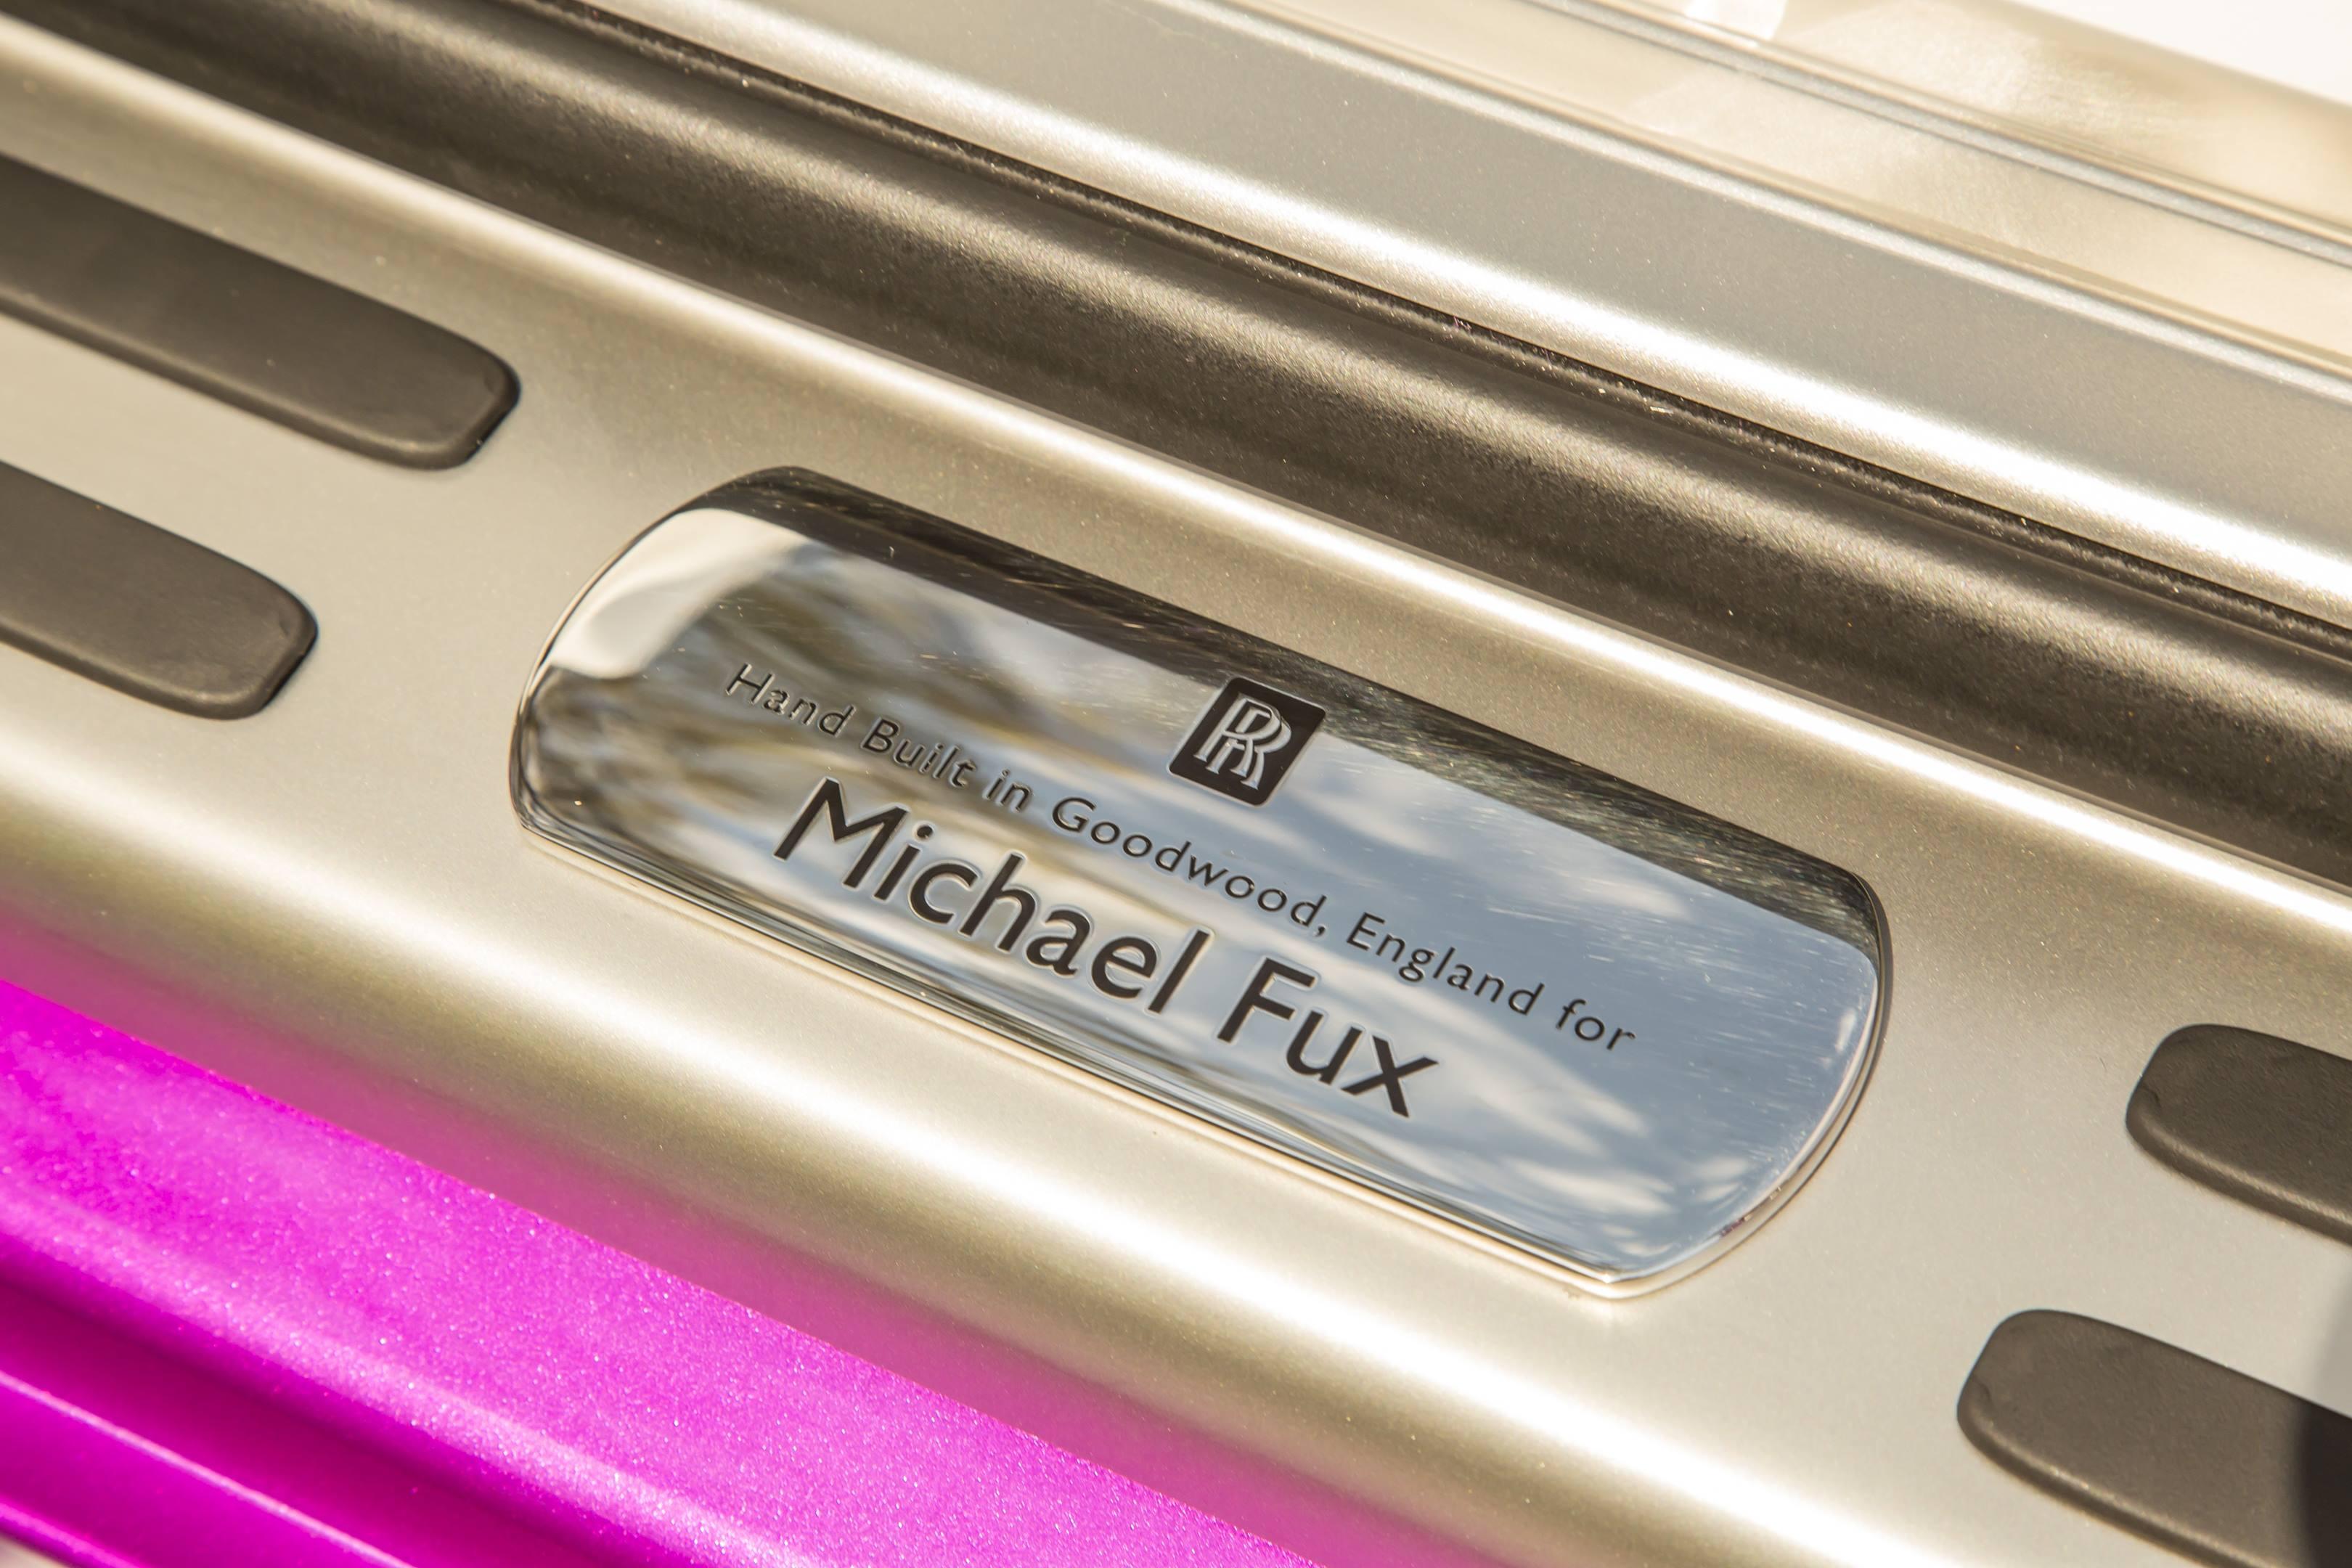 Michael Fux's Rolls-Royce Dawn convertible plaque